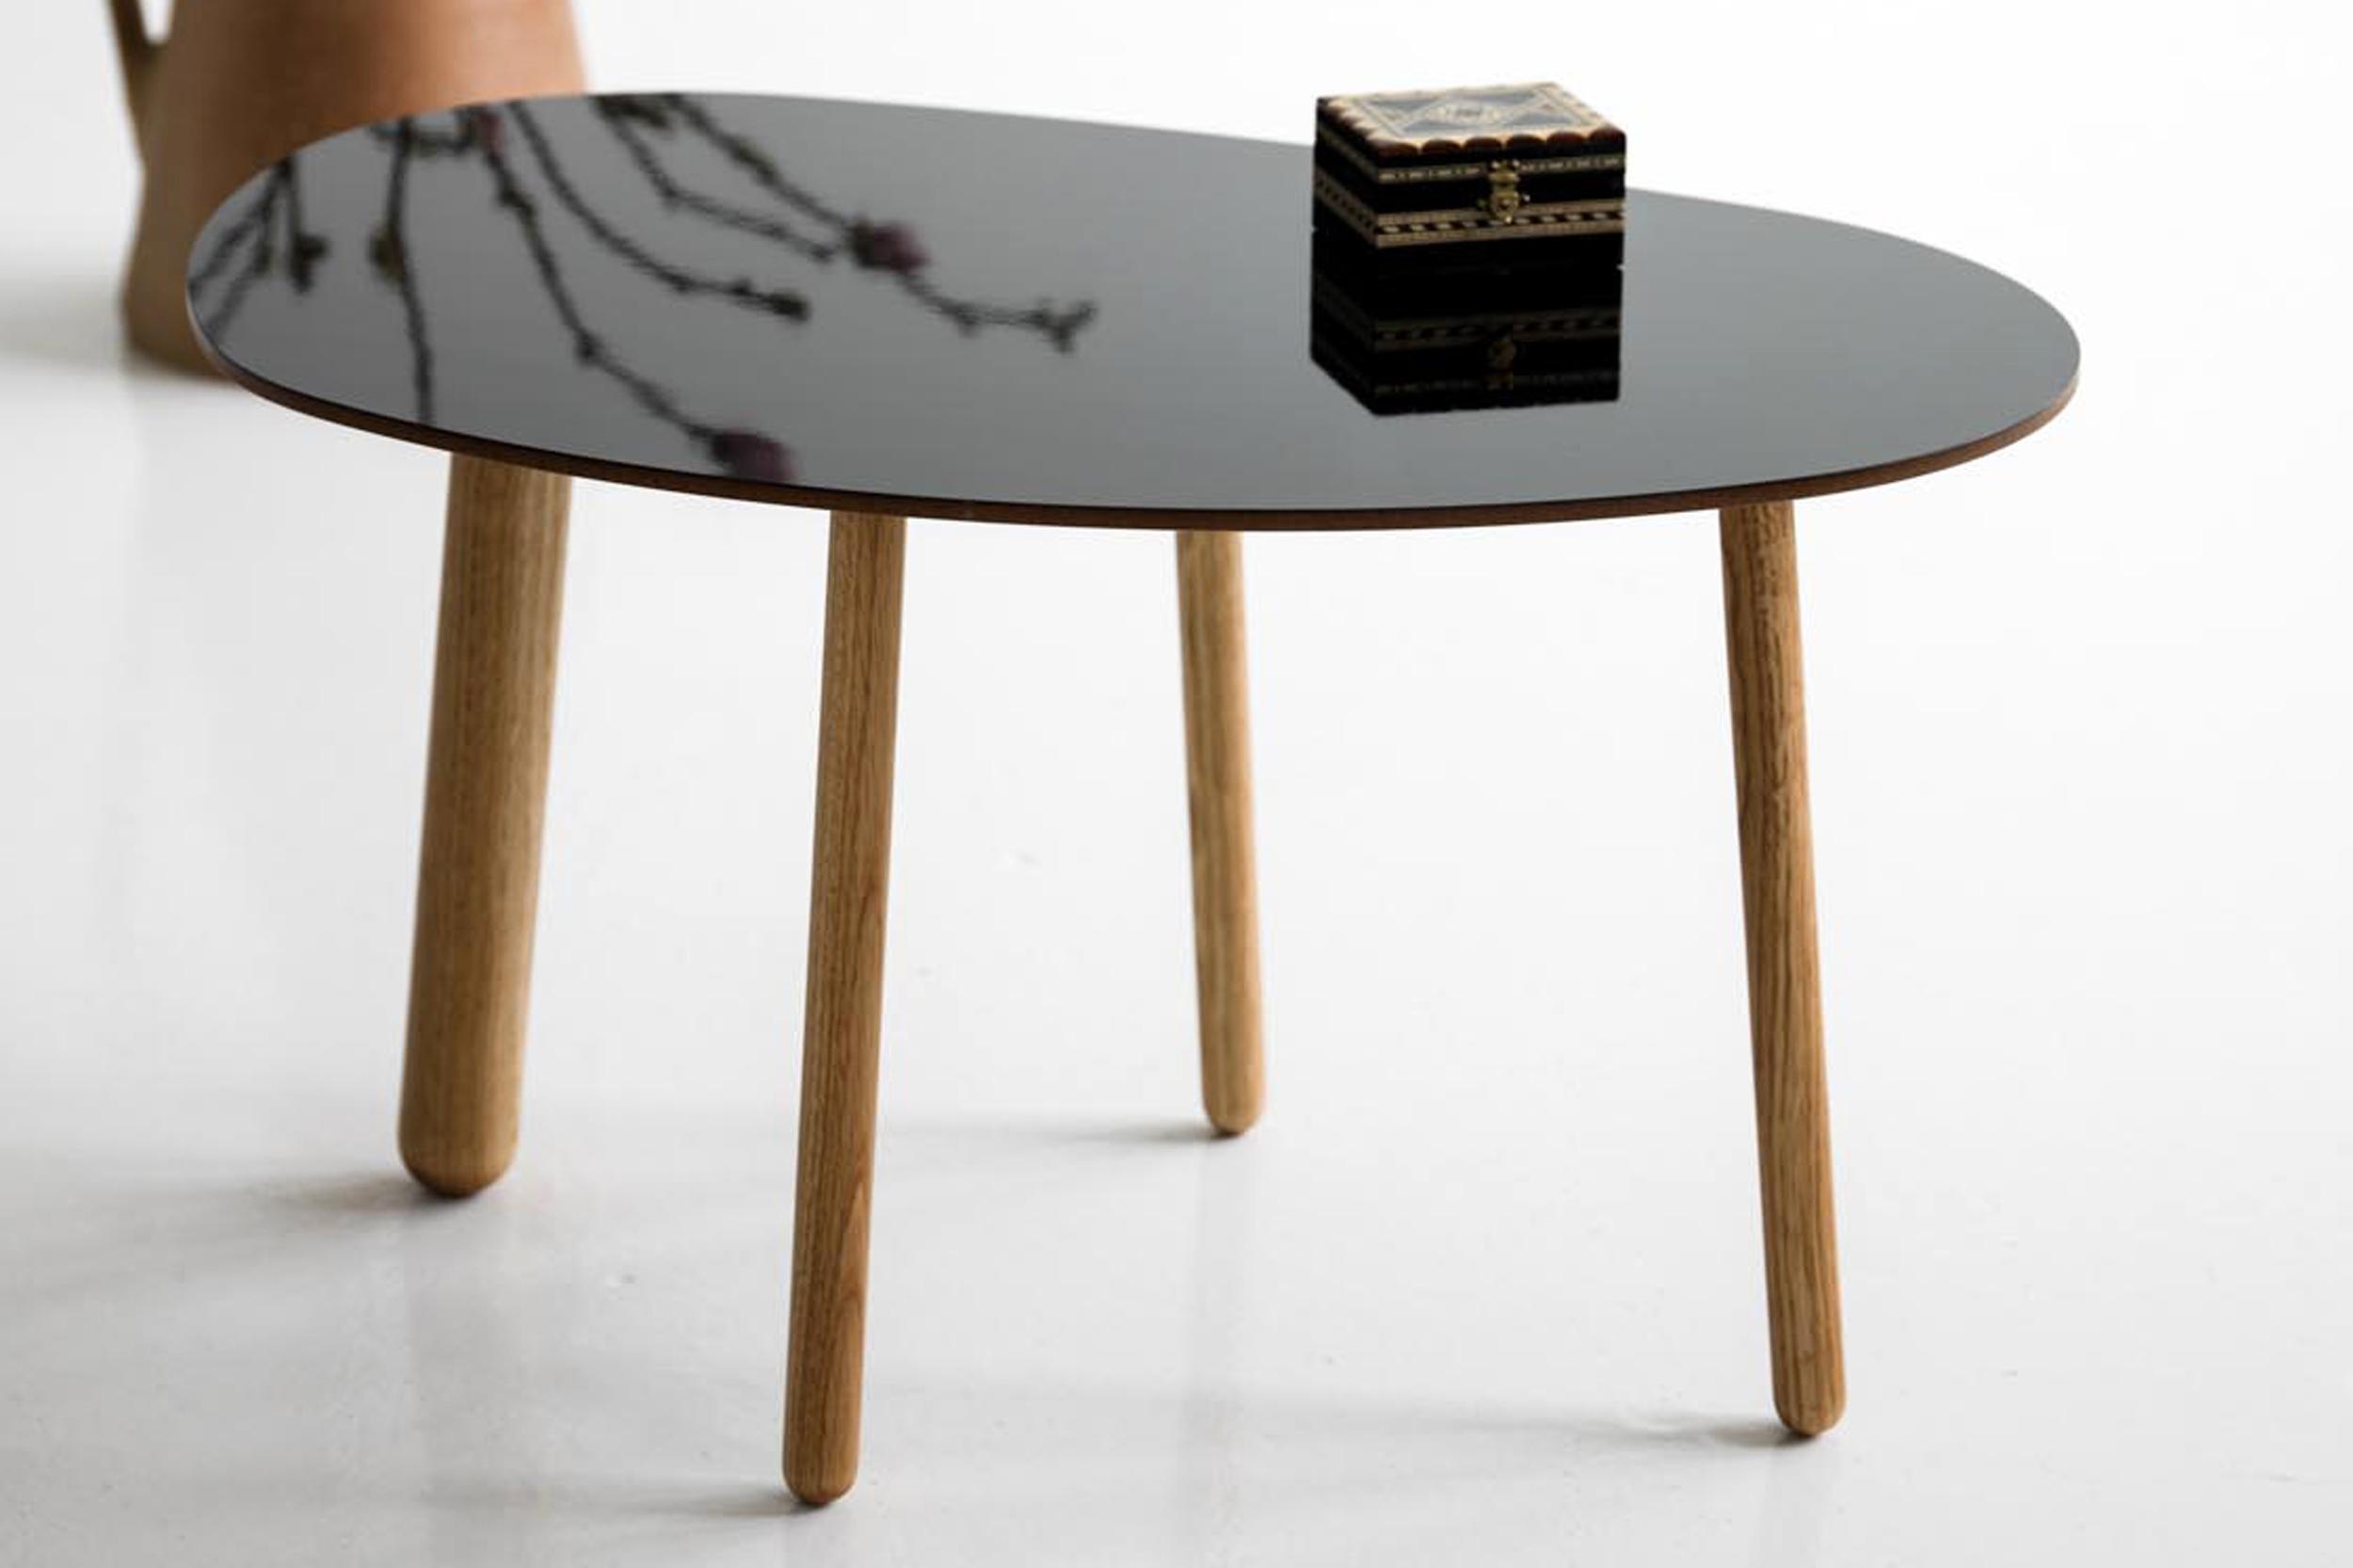 Morris coffee table model 4 in glossy black